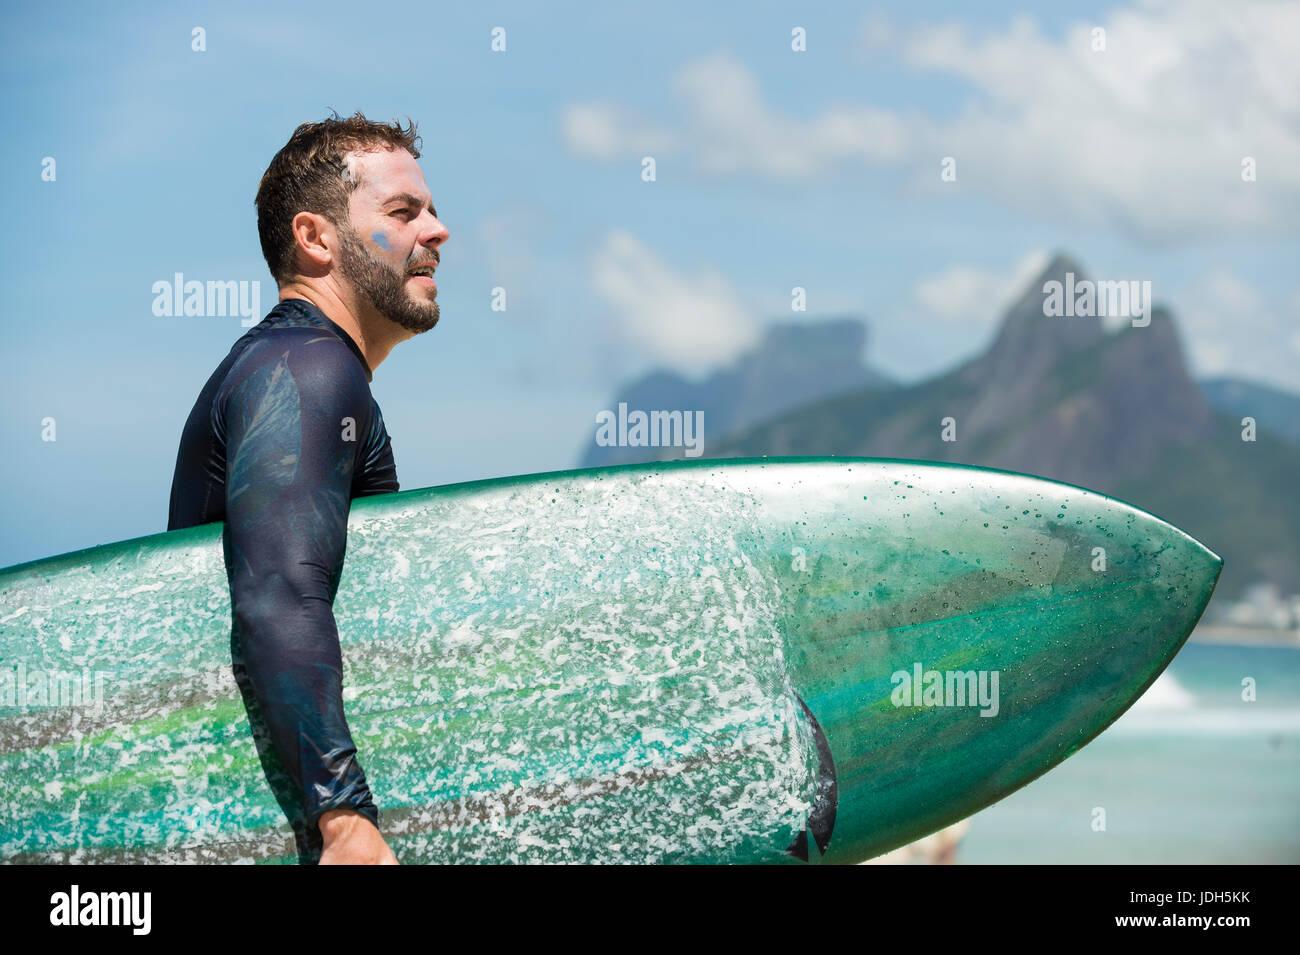 RIO DE JANEIRO - 10. Februar 2017: Brasilianische Surfer mit Surfbrett entlang des Ufers am Arpoador mit zwei Brüder Stockbild